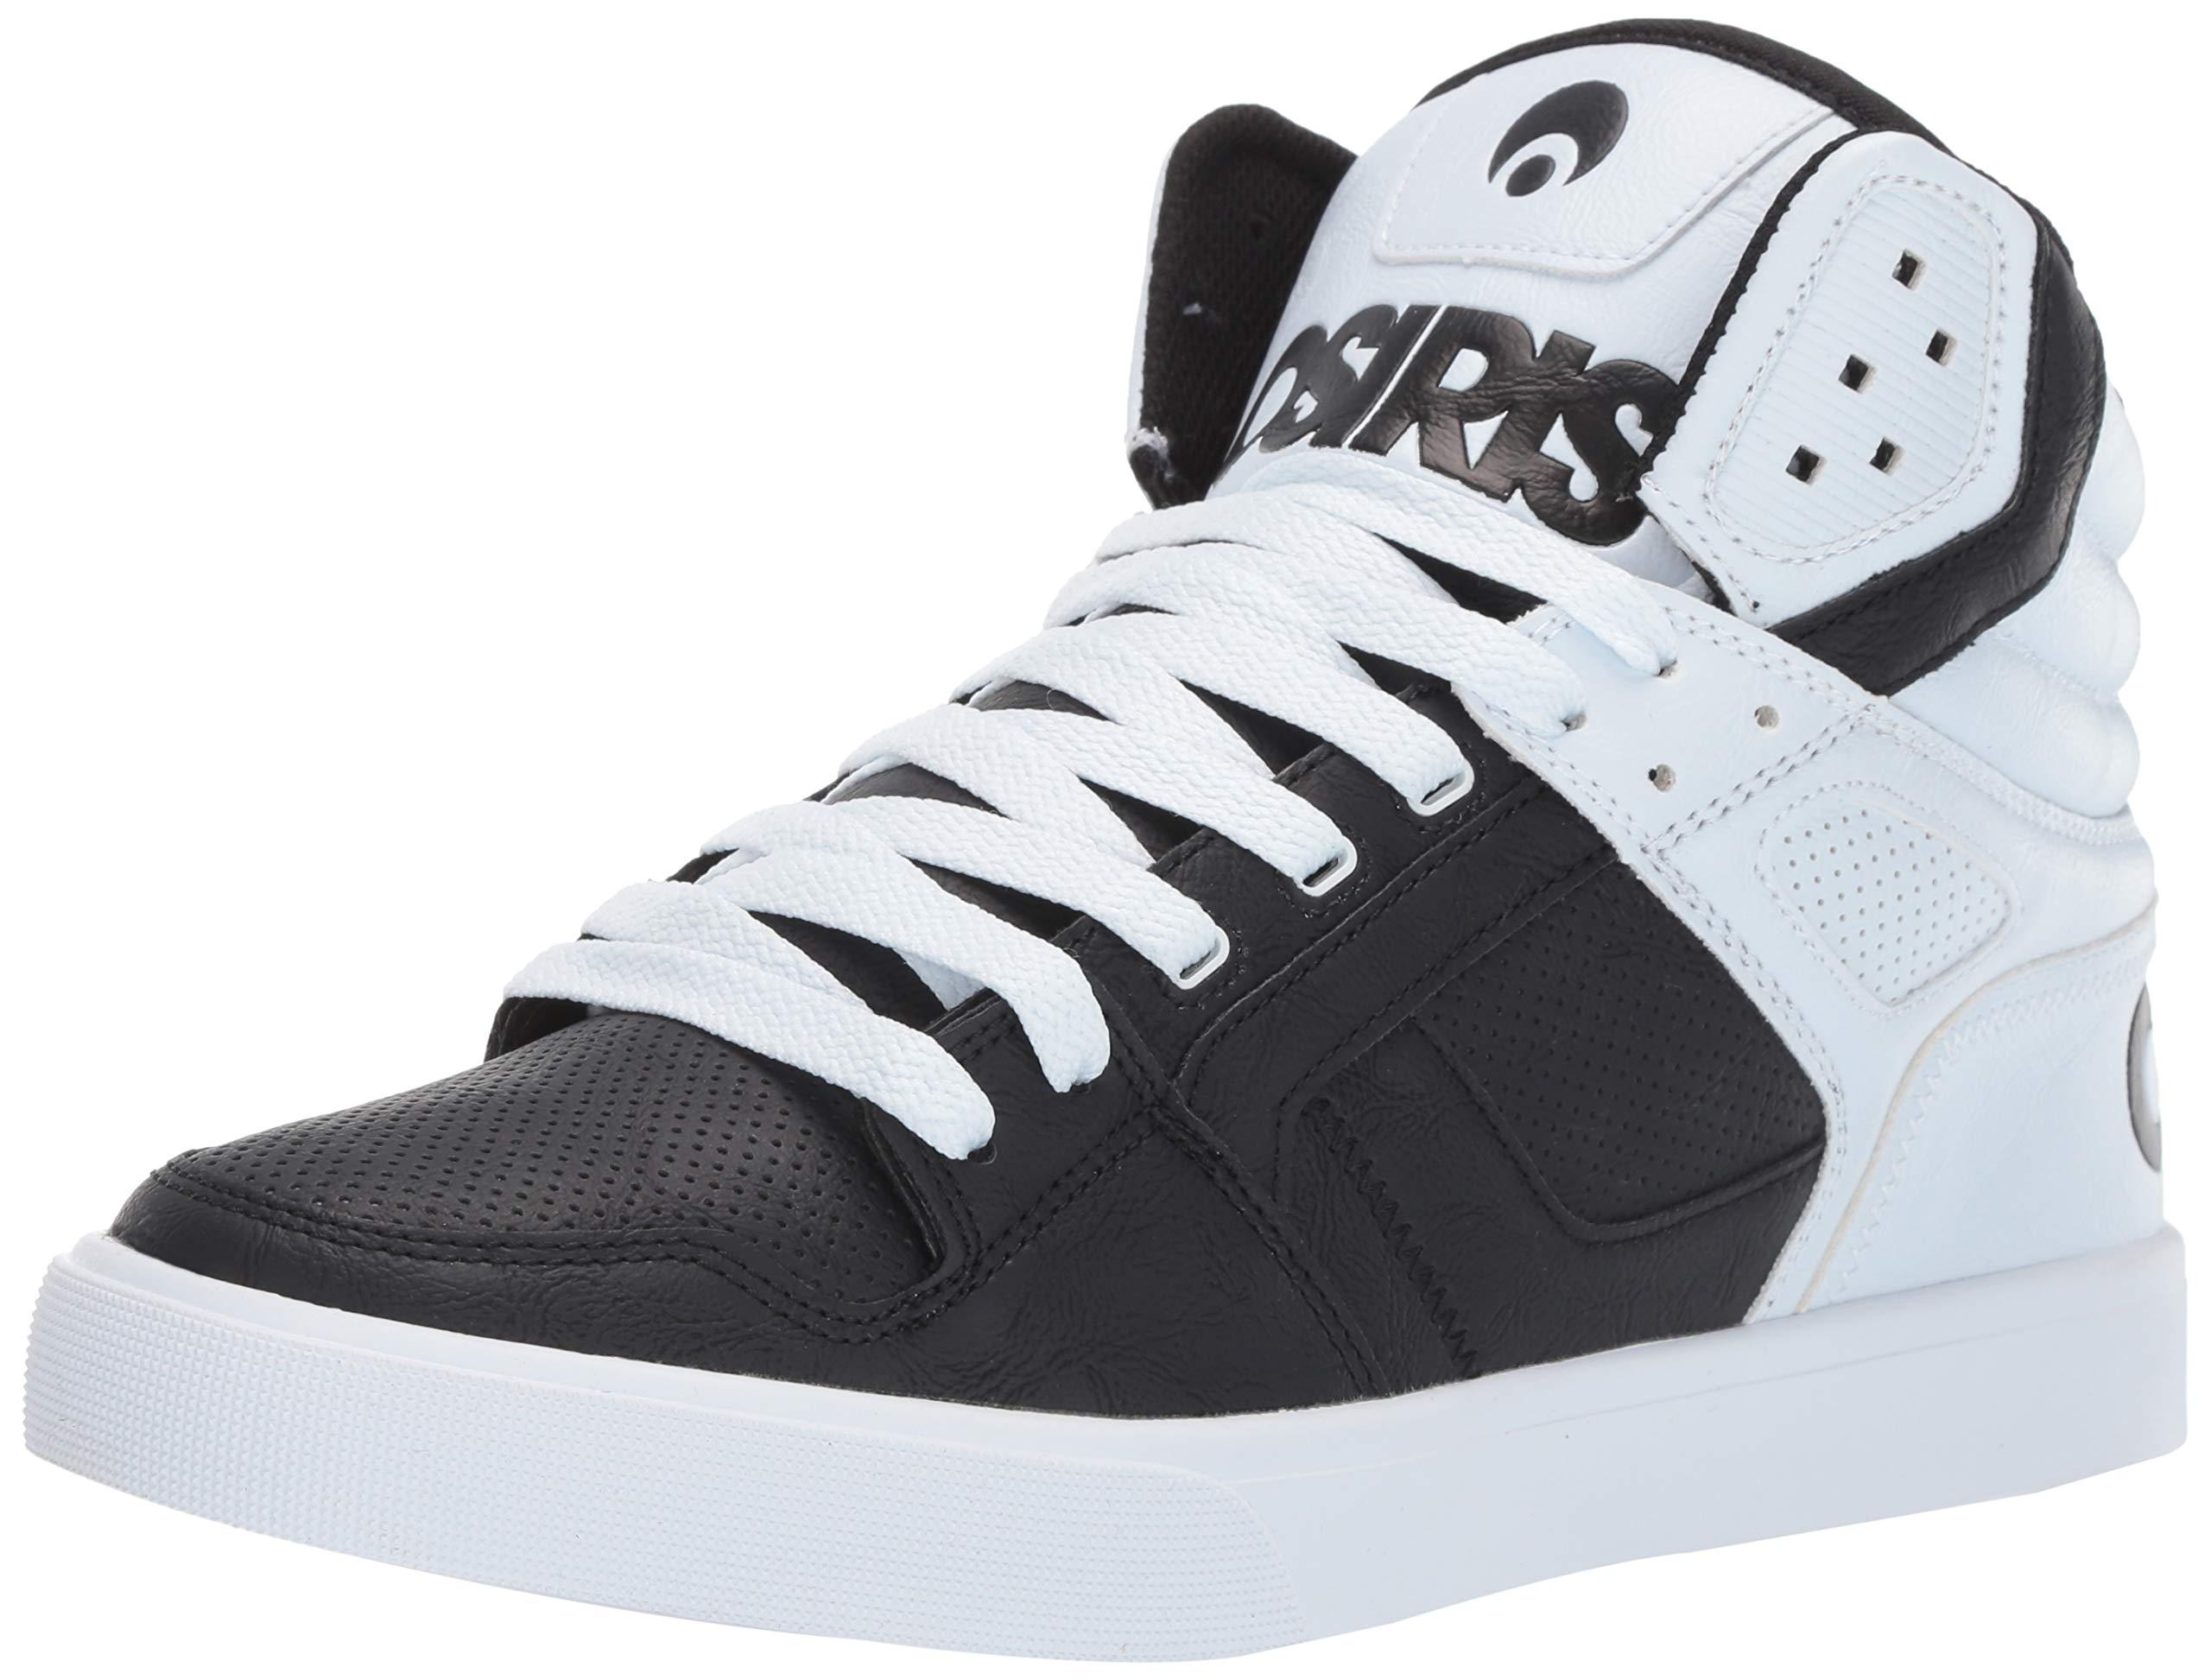 Clone Skate Shoe, Black/White/dip